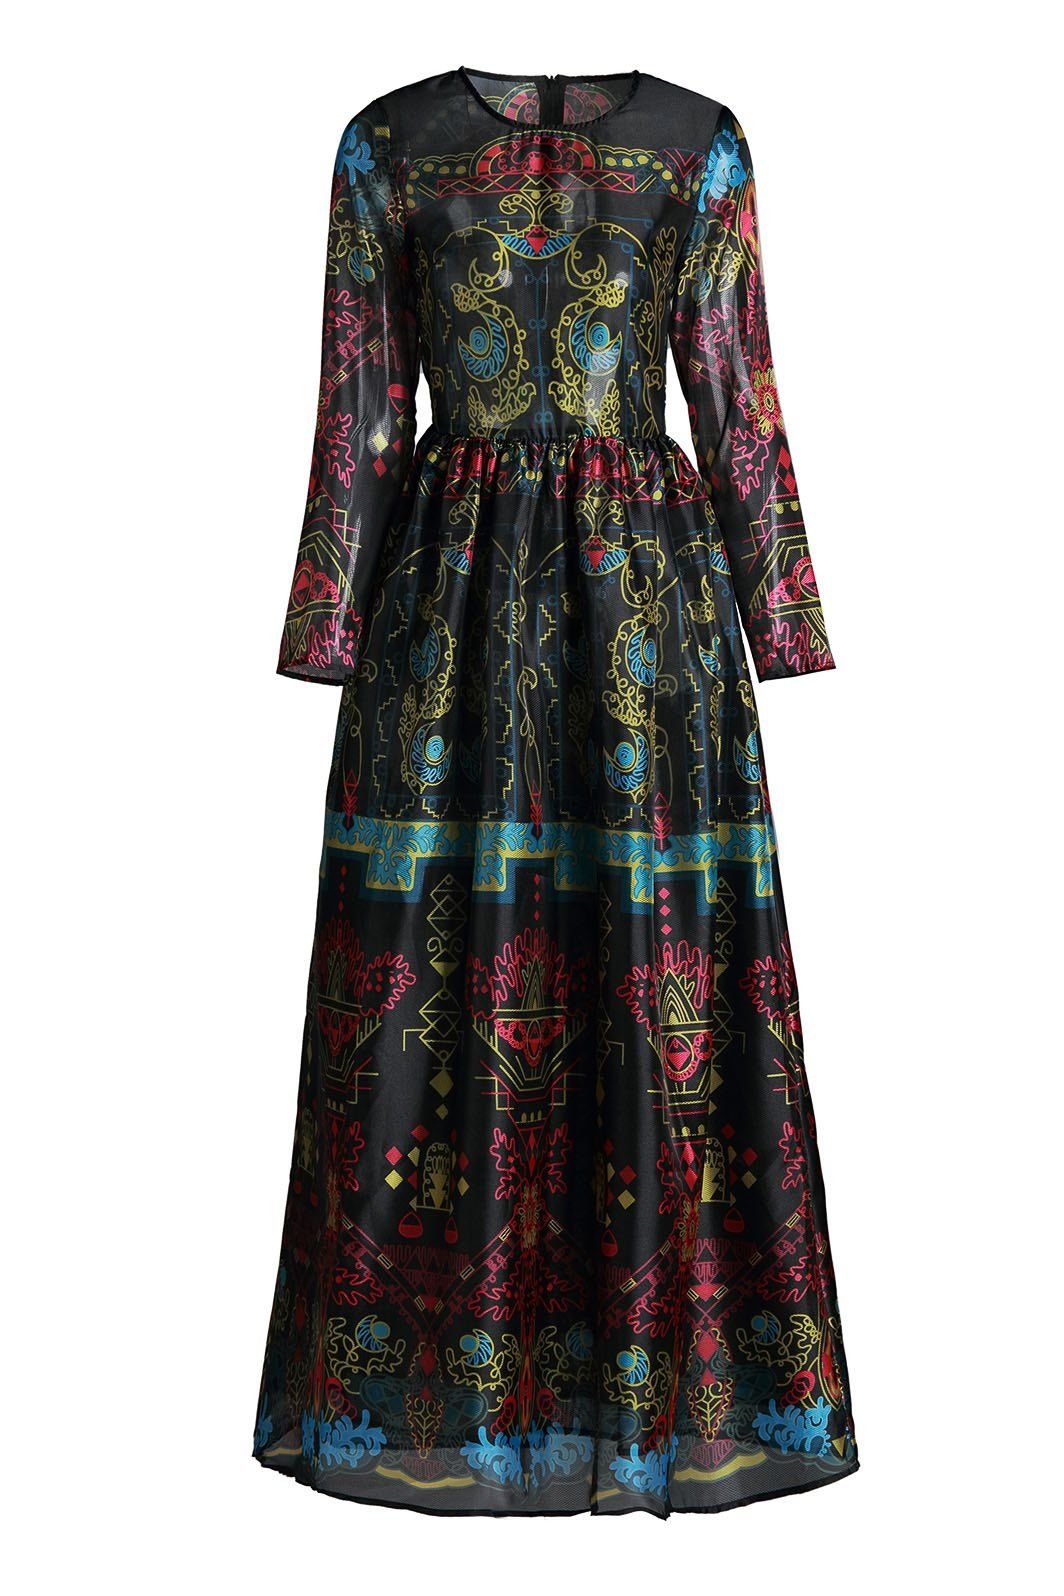 Elegant round neck long sleeve colorful vintage print womenus maxi